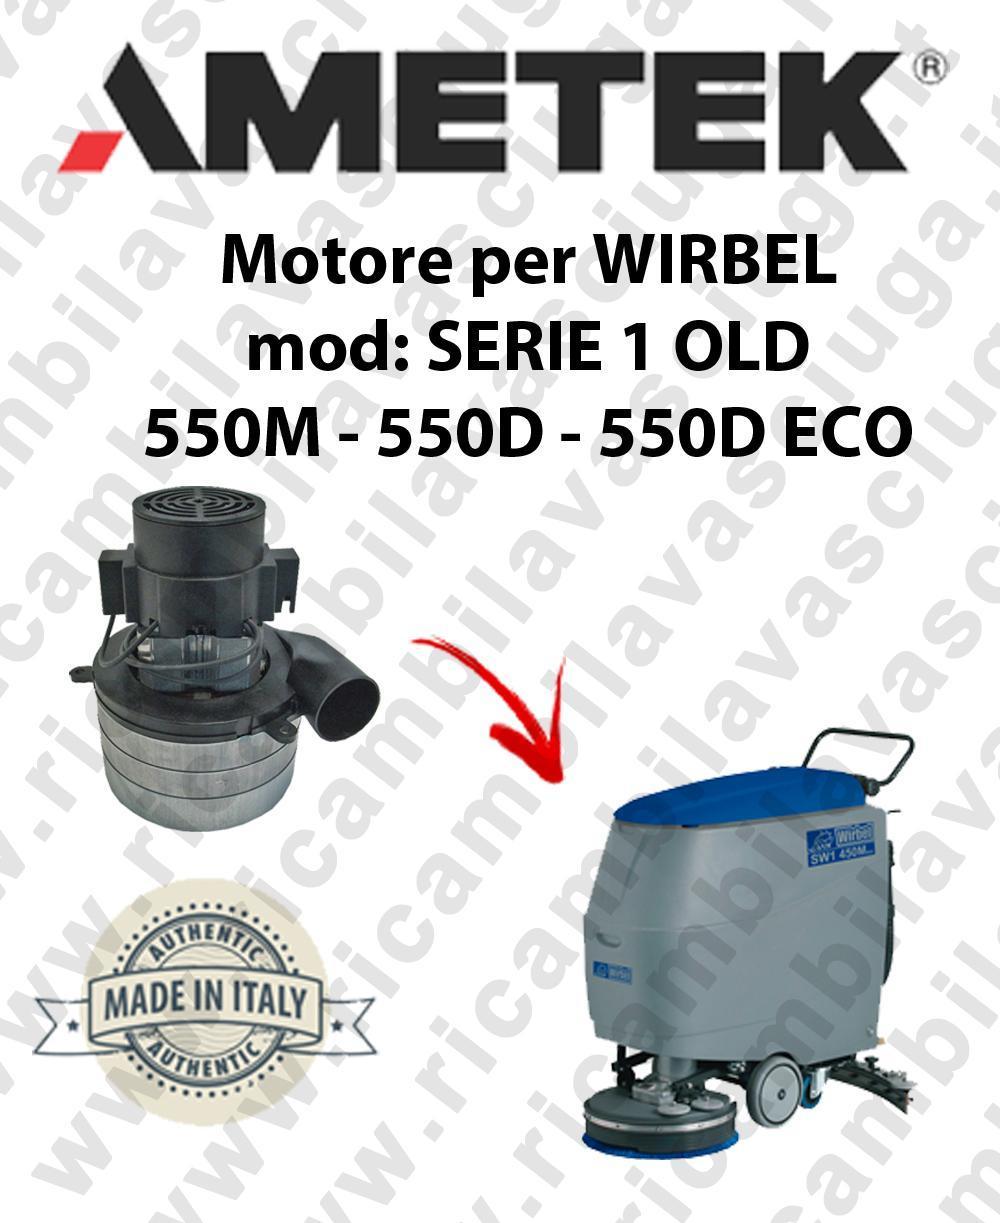 SERIE 1 OLD 550M 550D 550D ECO Motore de aspiración AMETEK para fregadora WIRBEL